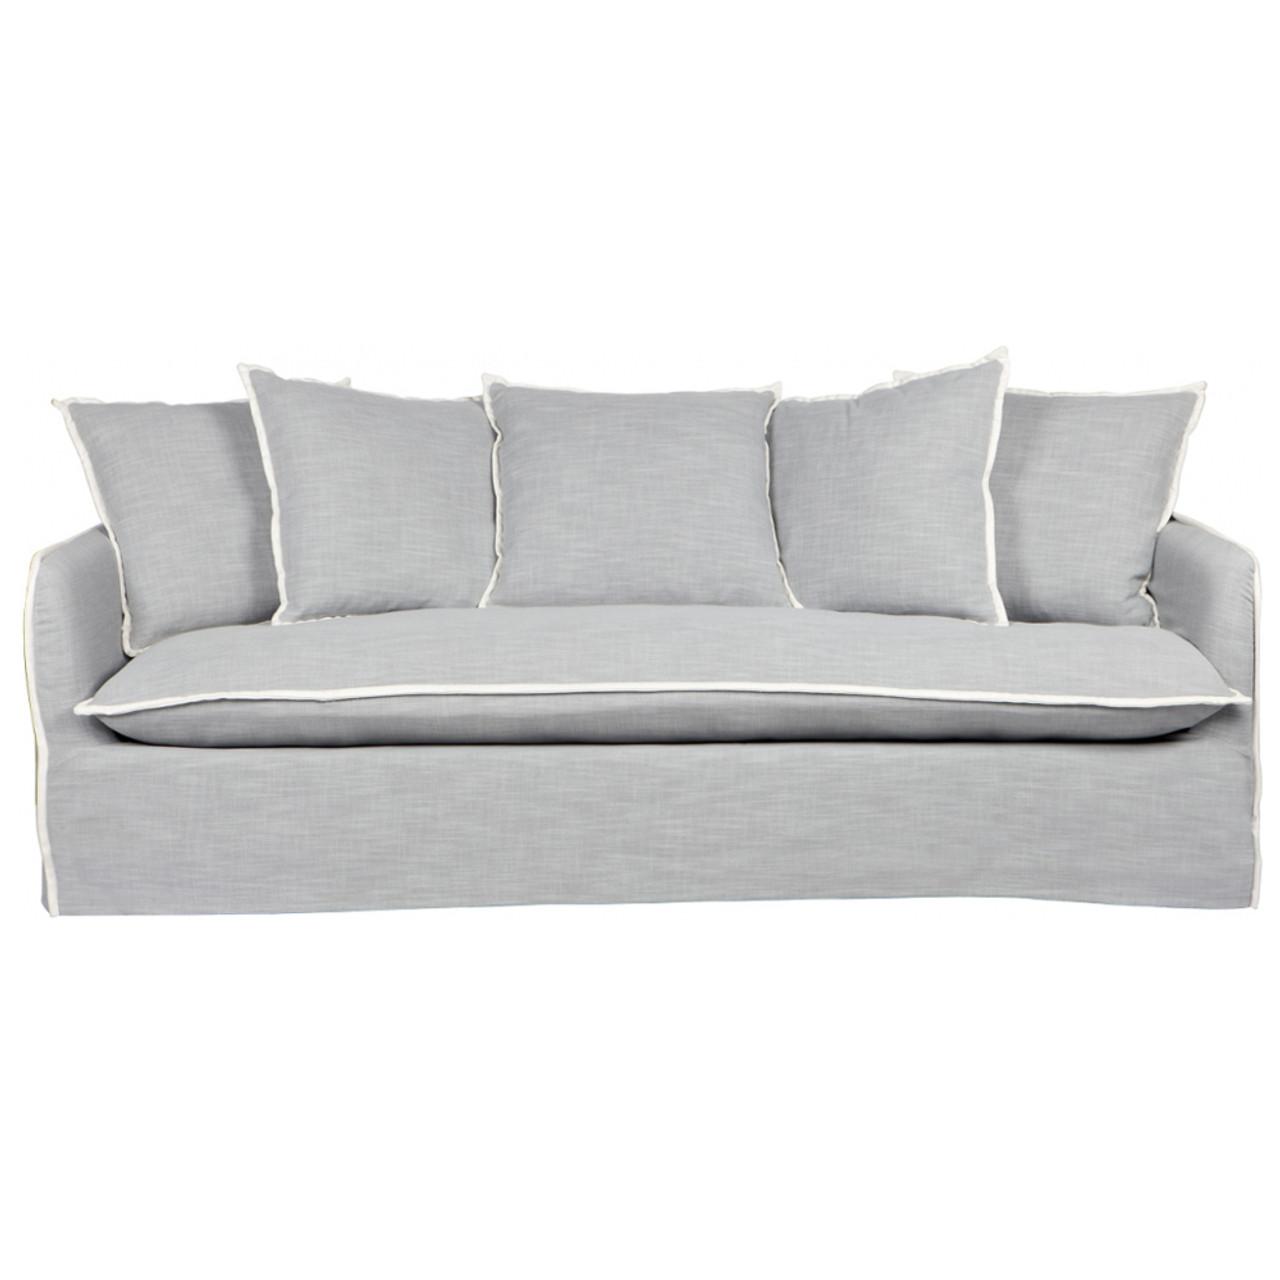 Outstanding Long Island Sofa 3 Seater Interior Design Ideas Clesiryabchikinfo